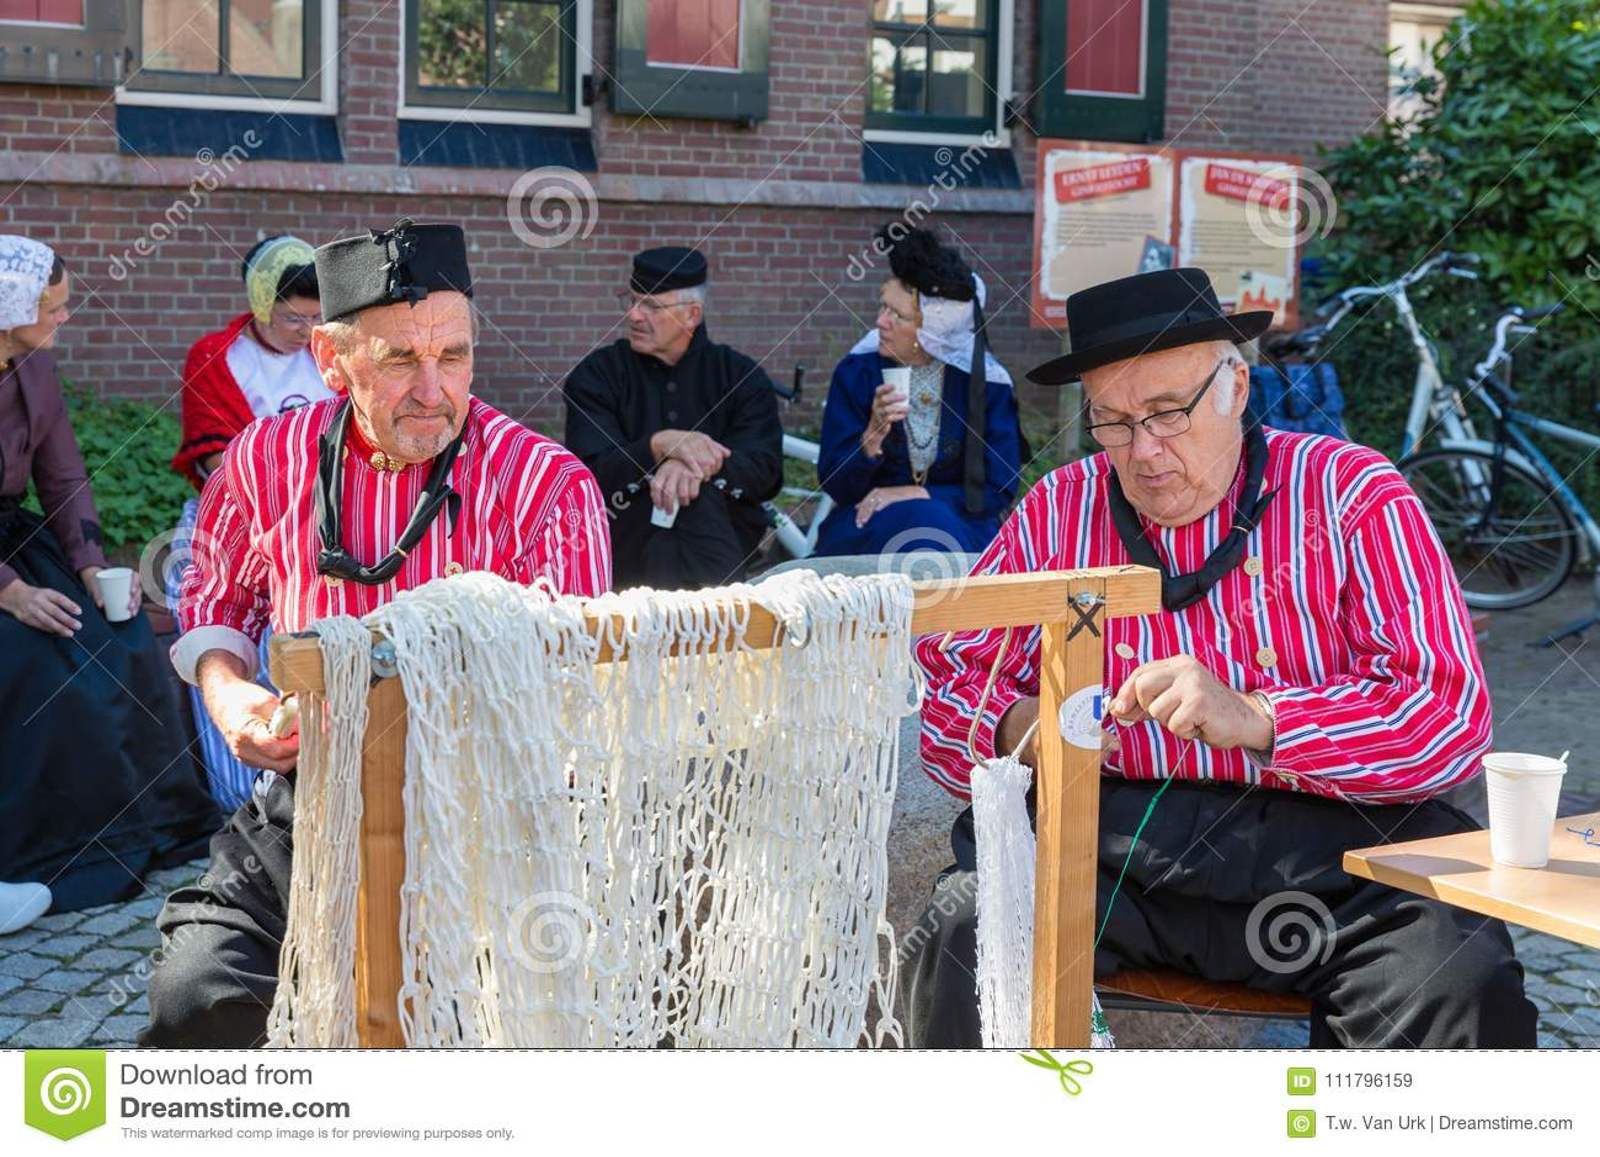 Nederlandse Kleding.Nederlandse Markt Met Mensen Die In Traditionele Kleding Visnetten